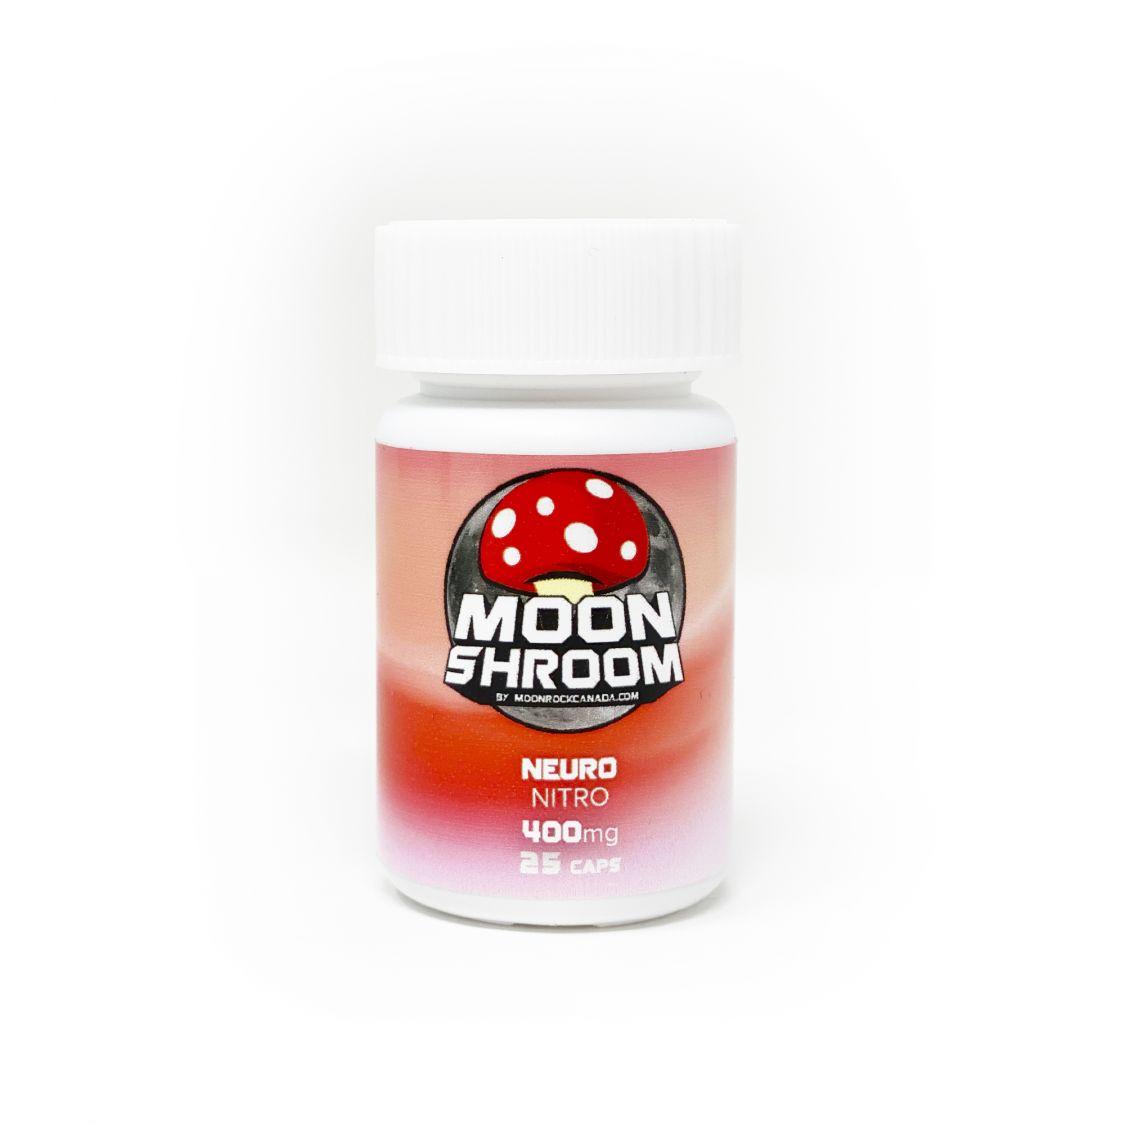 Moonrock Canada Nitro - Moonshroms (300mg) Capsules / Tablets Other